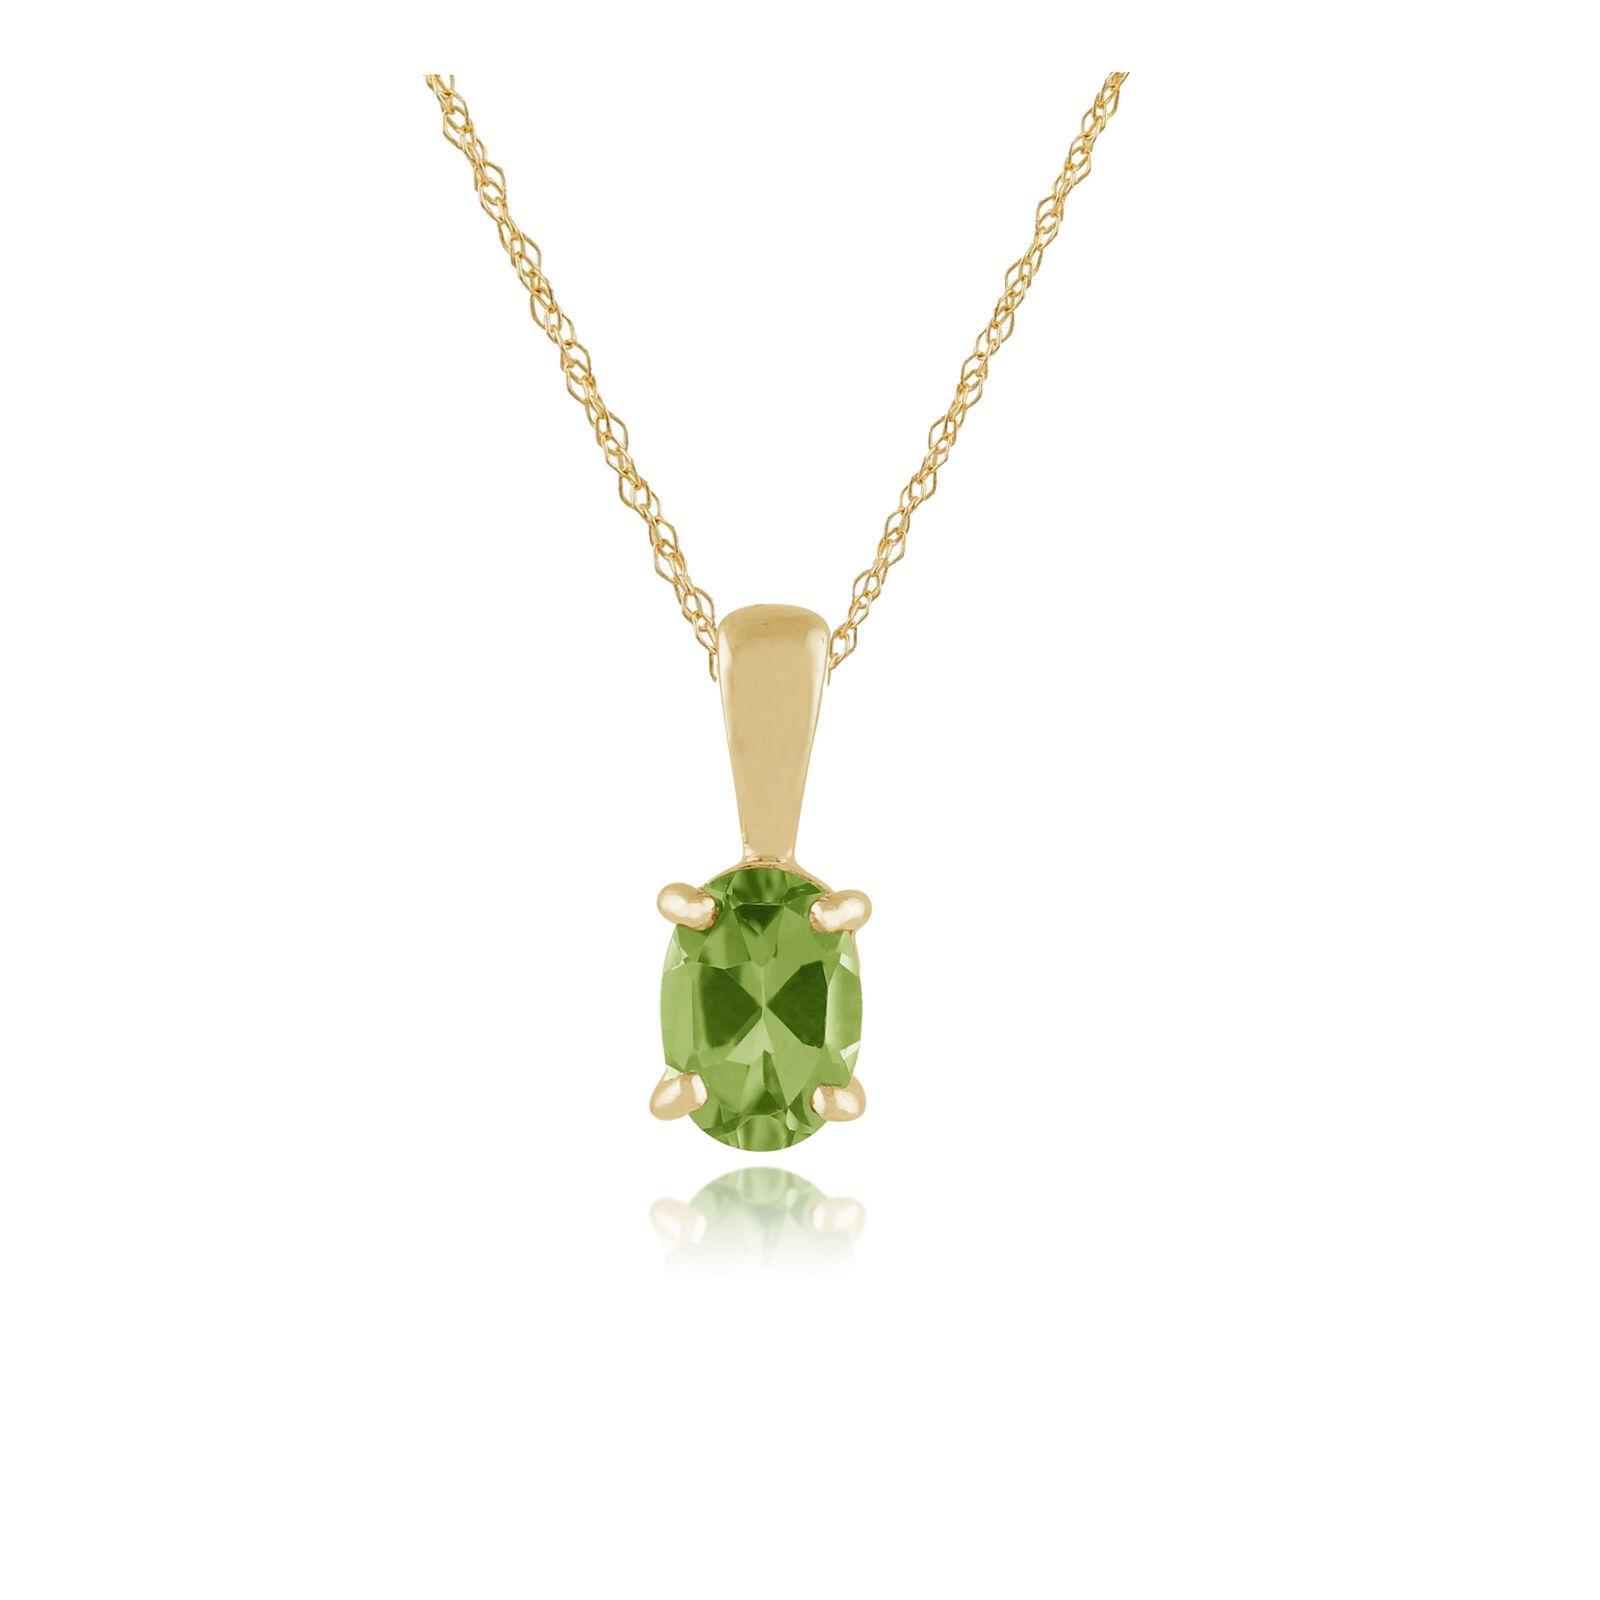 9ct Yellow gold 0.77ct Peridot Classic Single Stone Oval Pendant on Chain